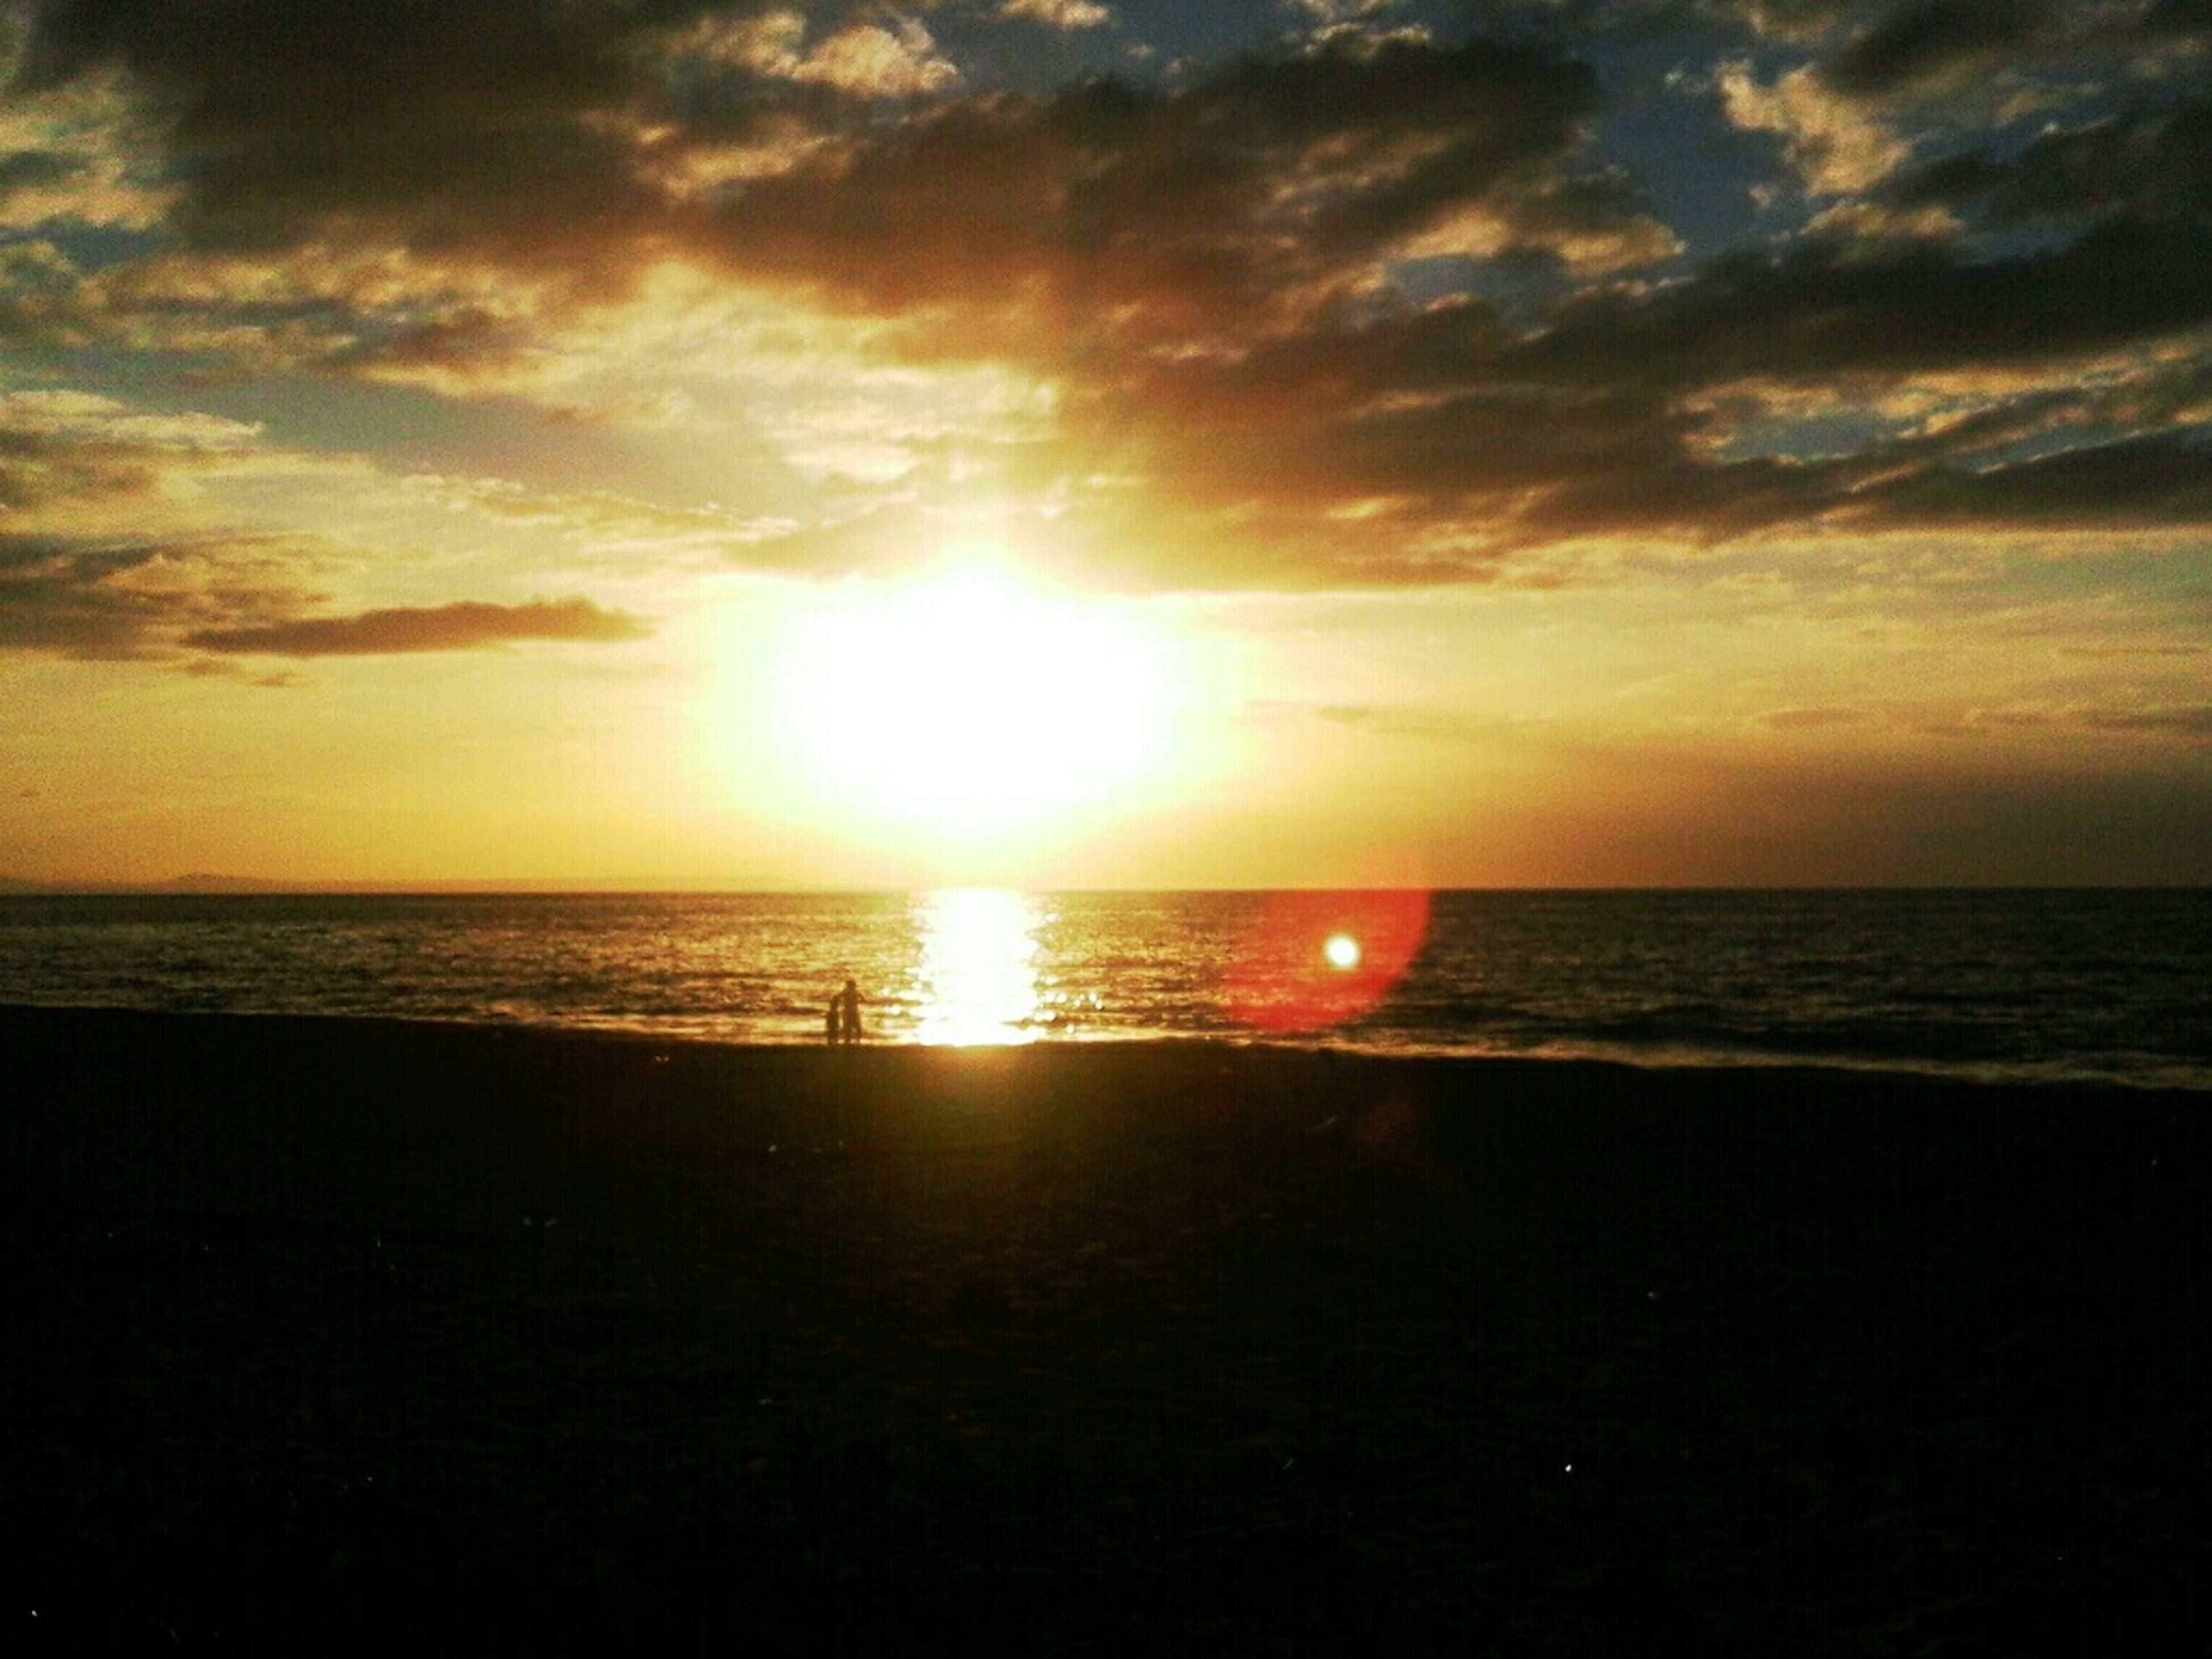 horizon over water, sea, sun, water, sunset, scenics, sky, tranquil scene, beauty in nature, tranquility, beach, reflection, idyllic, sunlight, nature, cloud - sky, shore, sunbeam, cloud, orange color